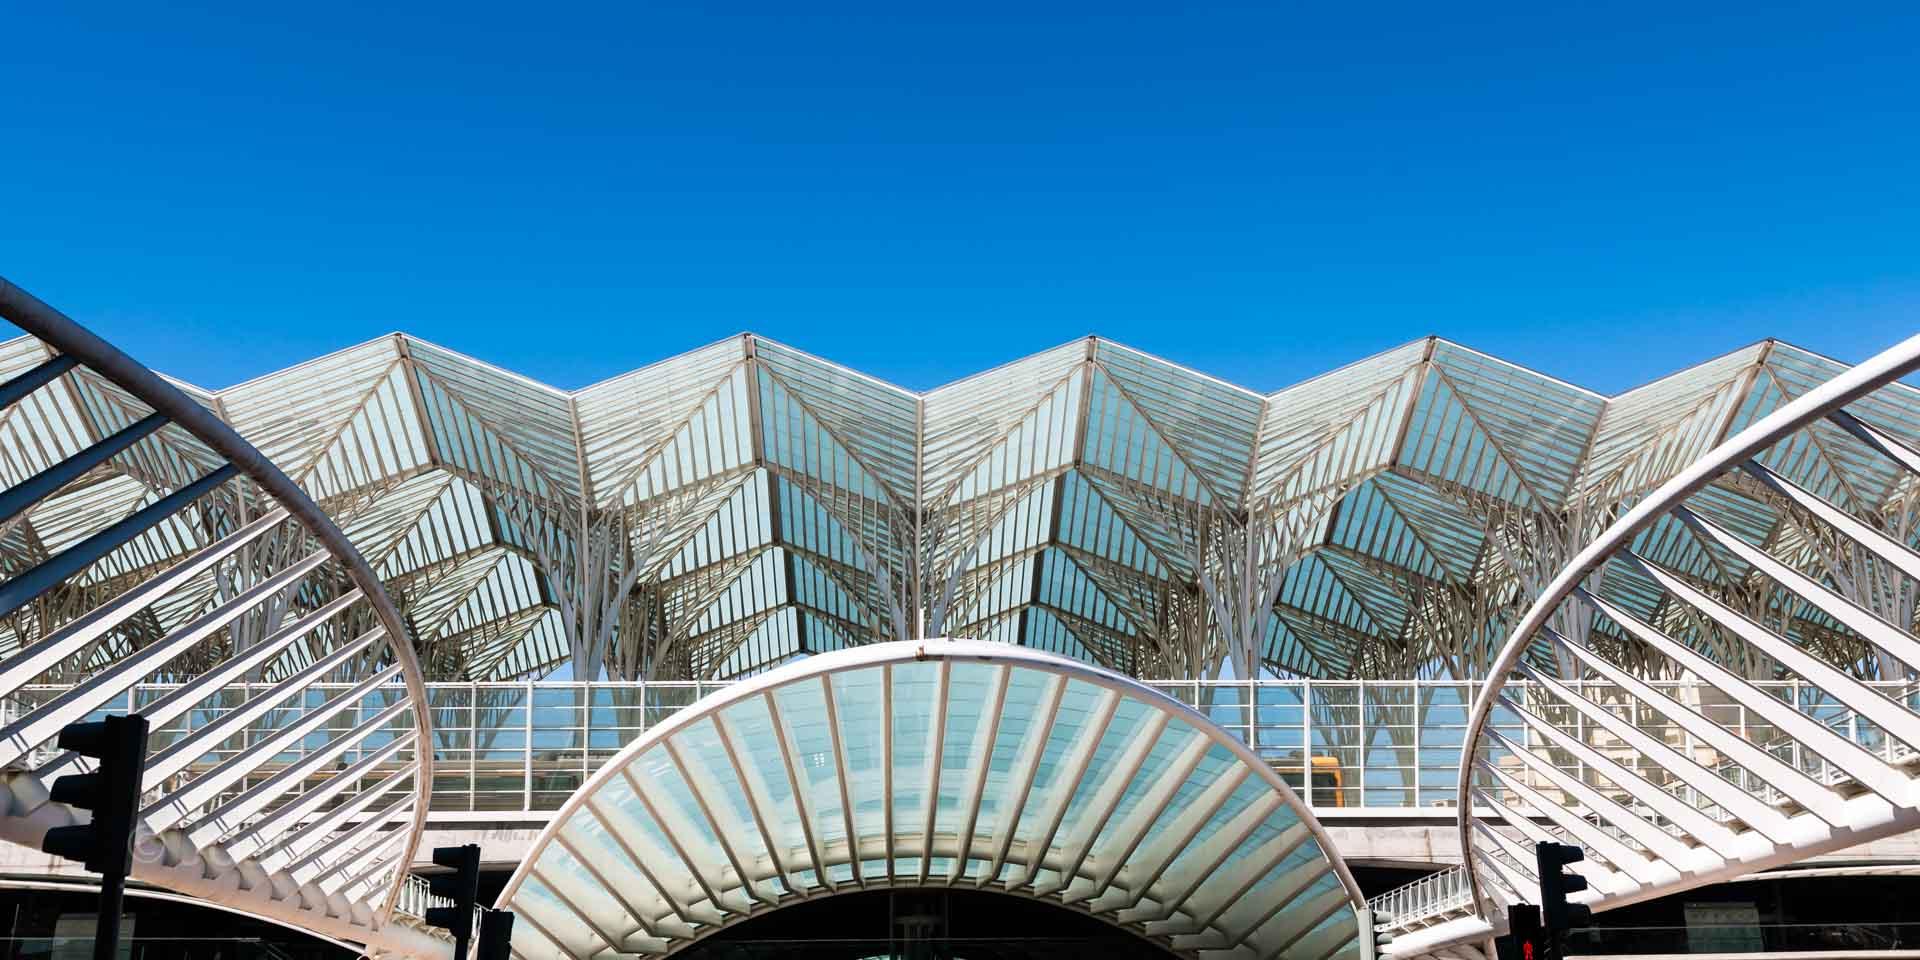 Lissabon Bahnhof